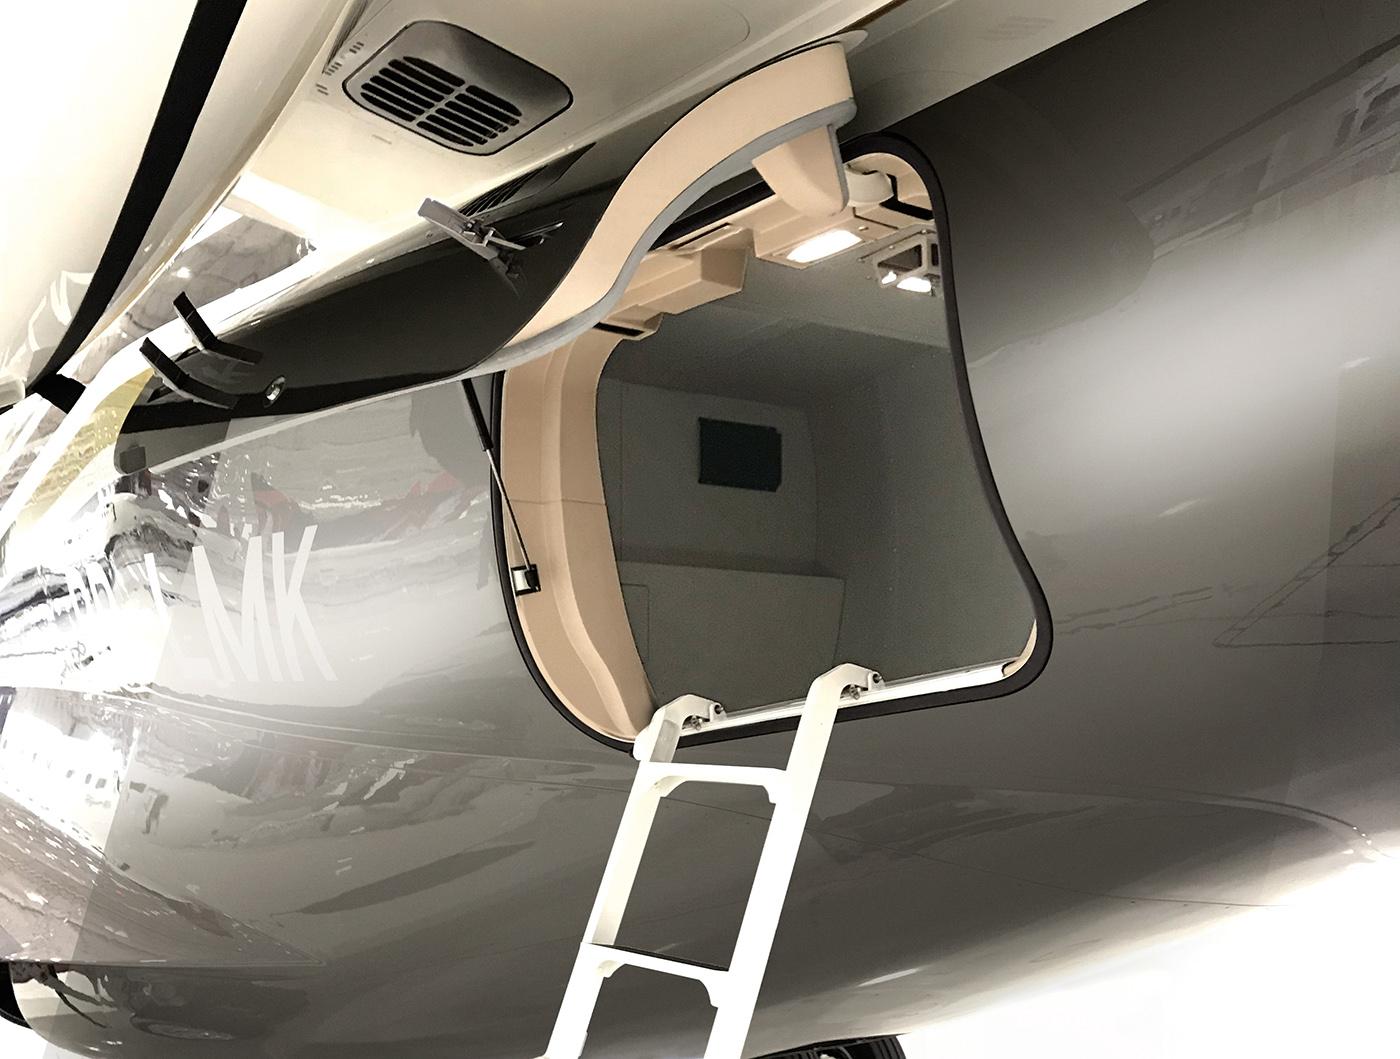 Embraer PRAETOR 500 Private Jet Charter EMBRAER PRAETOR 500 PRIVATE JET HIRE EMBRAER PRIVATE CHARTER MLKJETS2 1 - Empty leg flights private flight charter